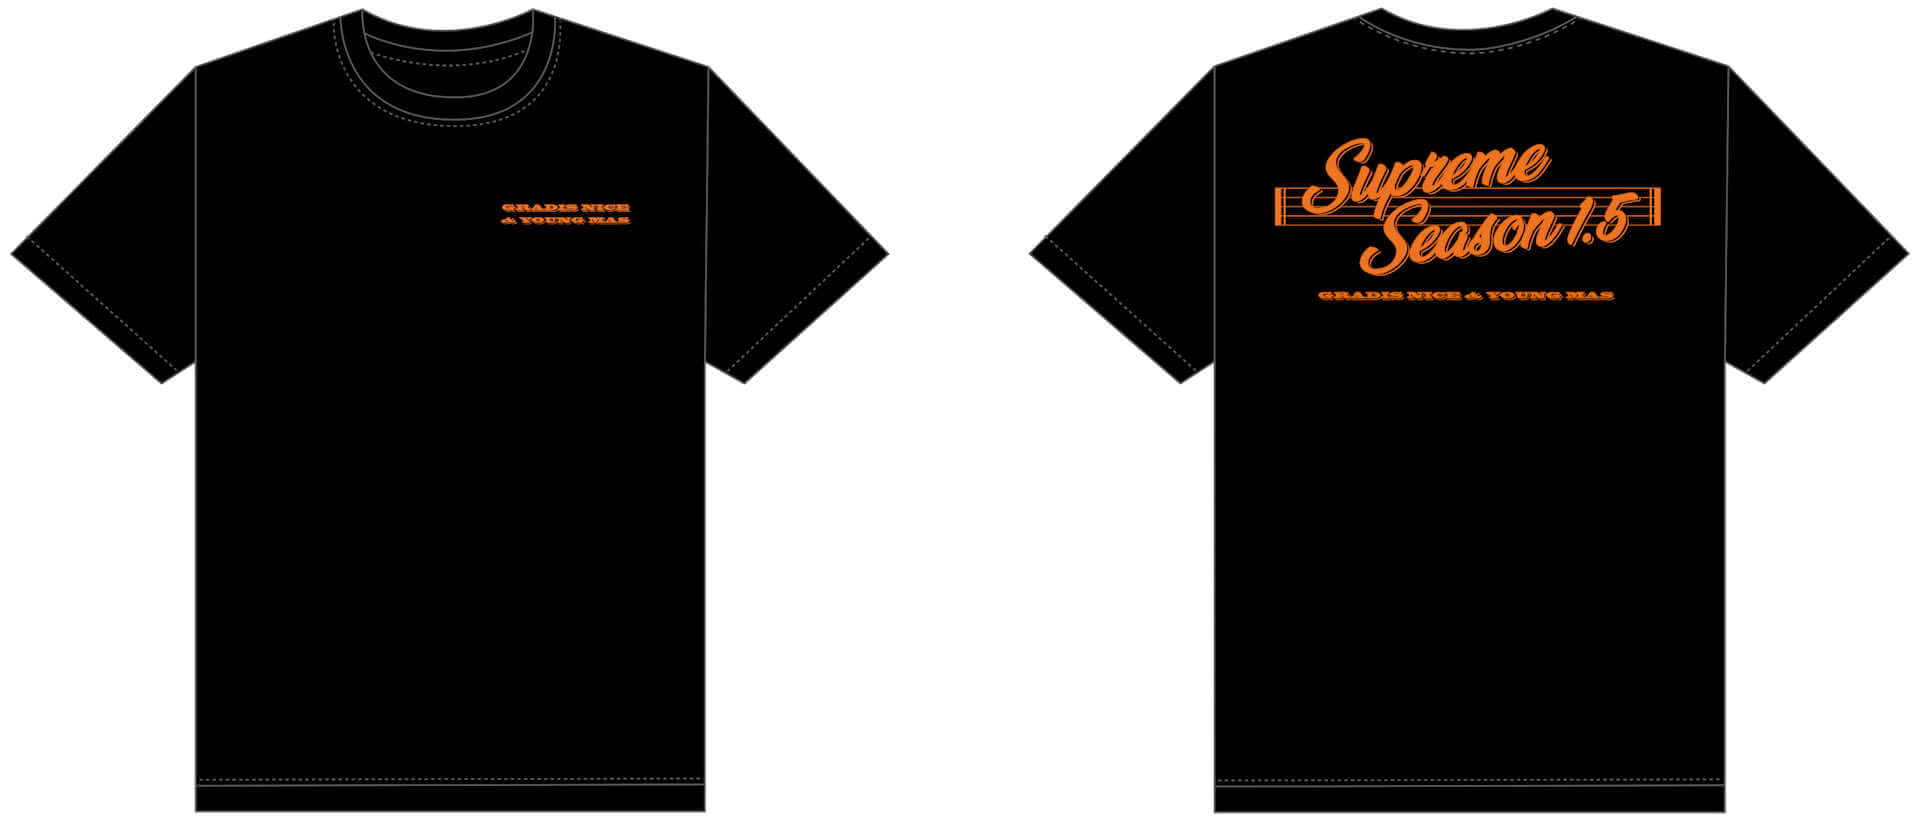 GRADIS NICE & YOUNG MAS、アルバム発売記念Tシャツを数量限定販売| NY在住Toya Horiuchiがデザイン music190819_febbasyoungmason_gradisnice_tshirt_2-1920x827